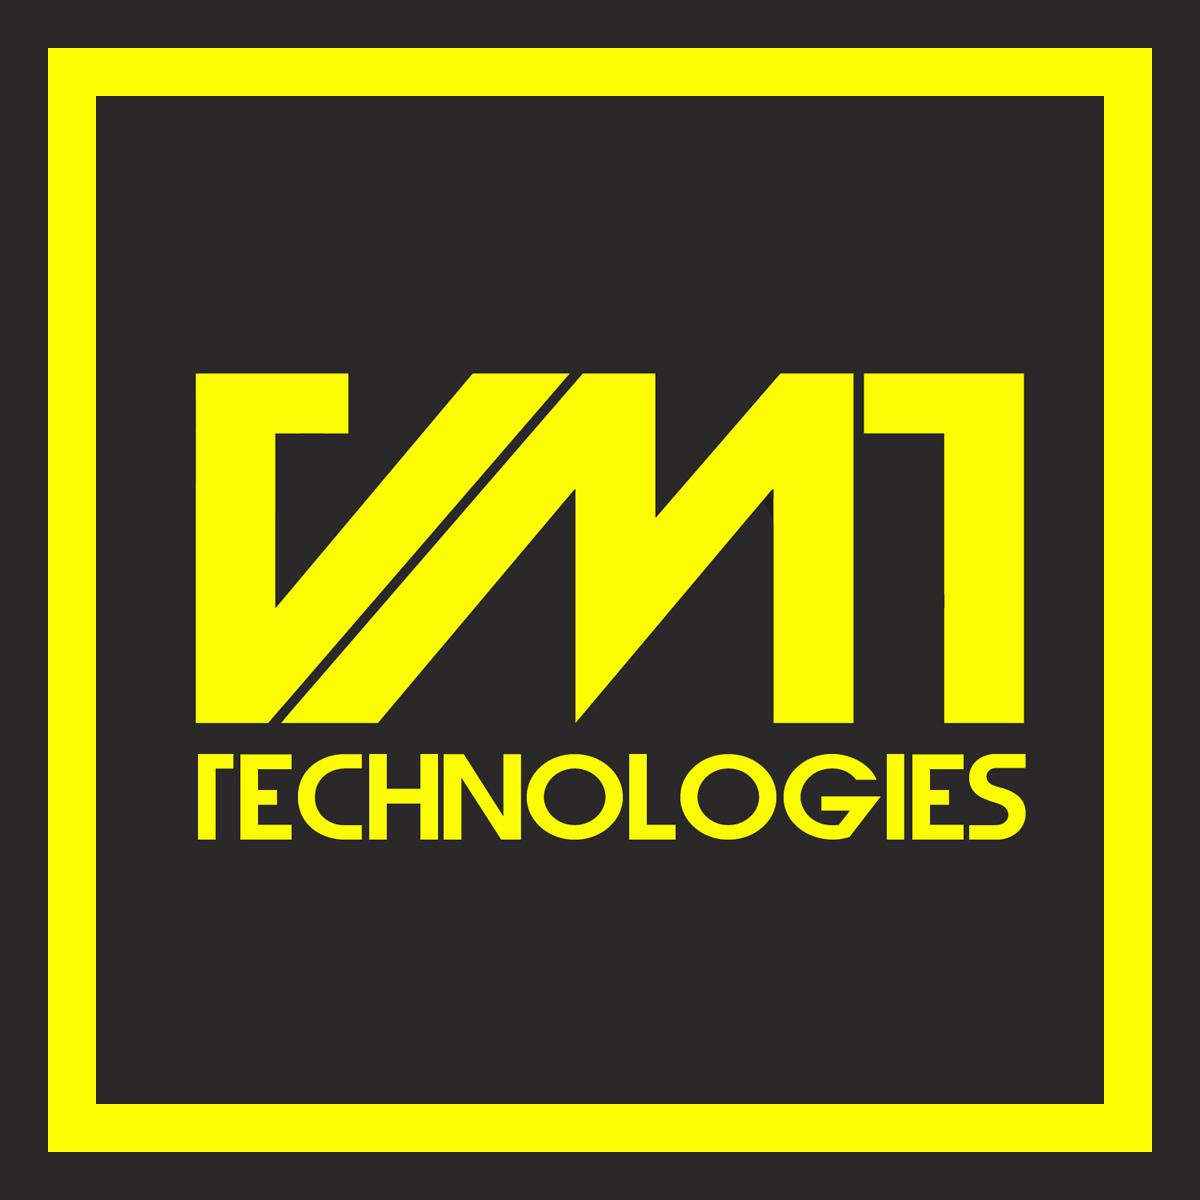 VM Technologies professional web design company